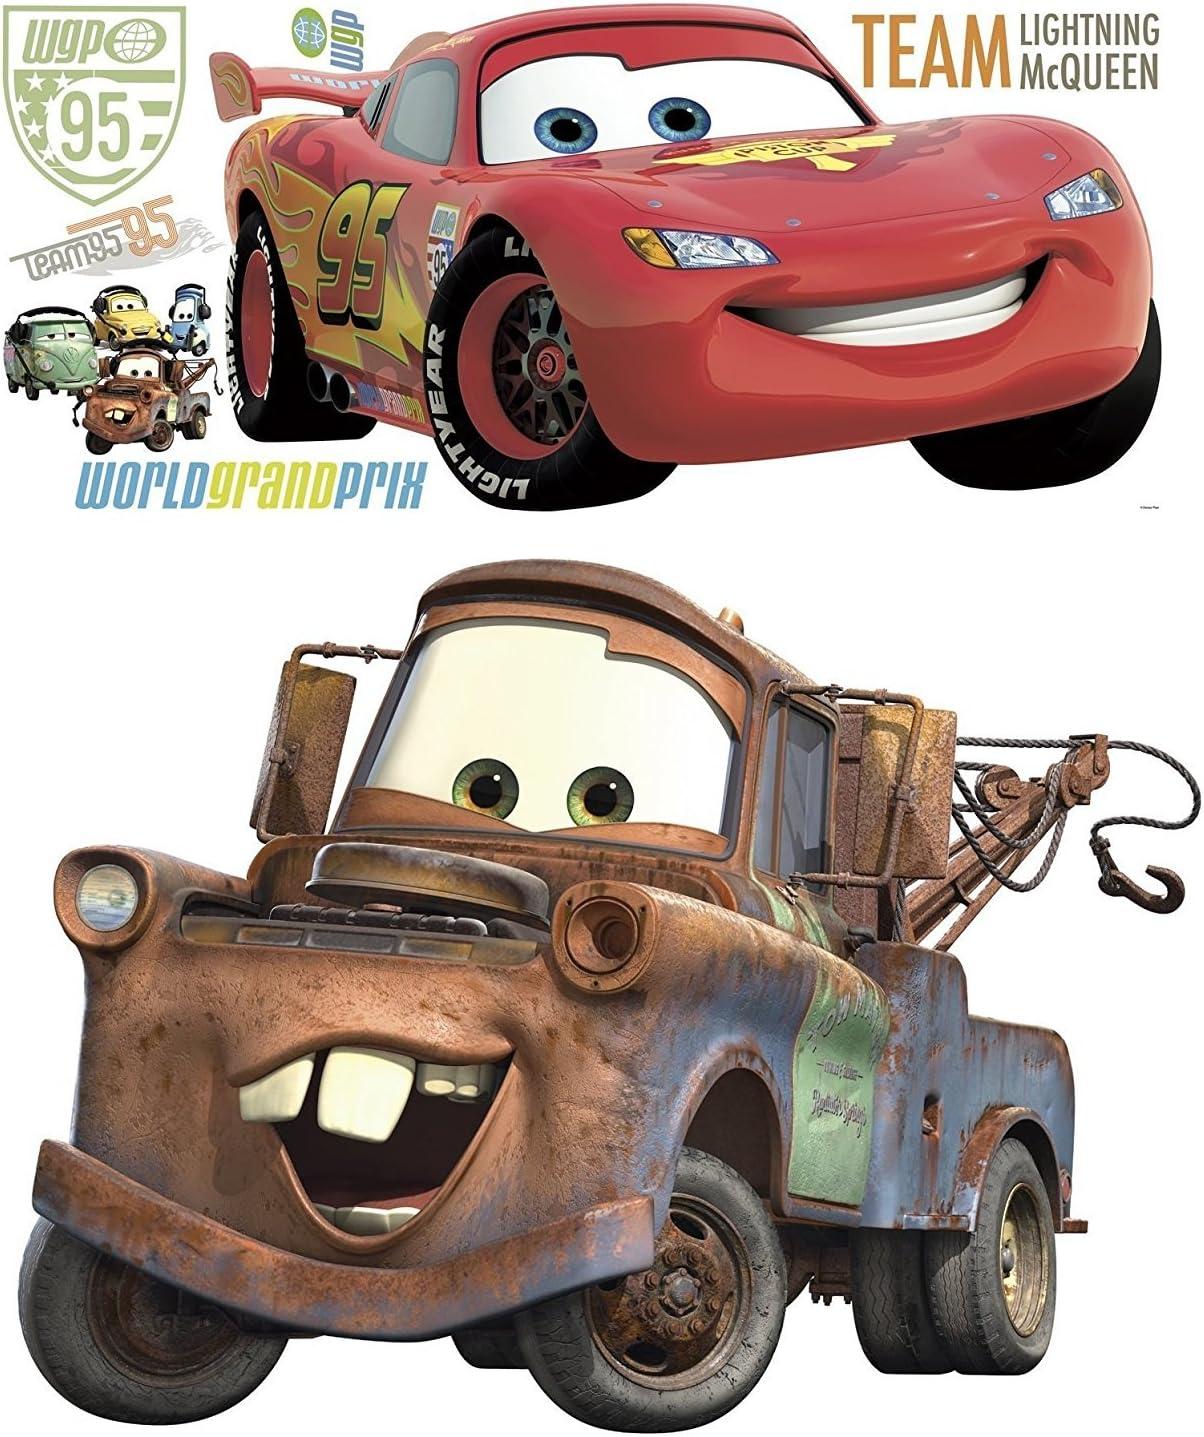 Amazon Com Disney Pixar Cars 2 Lightning Mcqueen Mater Peel And Stick Giant Wall Decal Bundle Toys Games